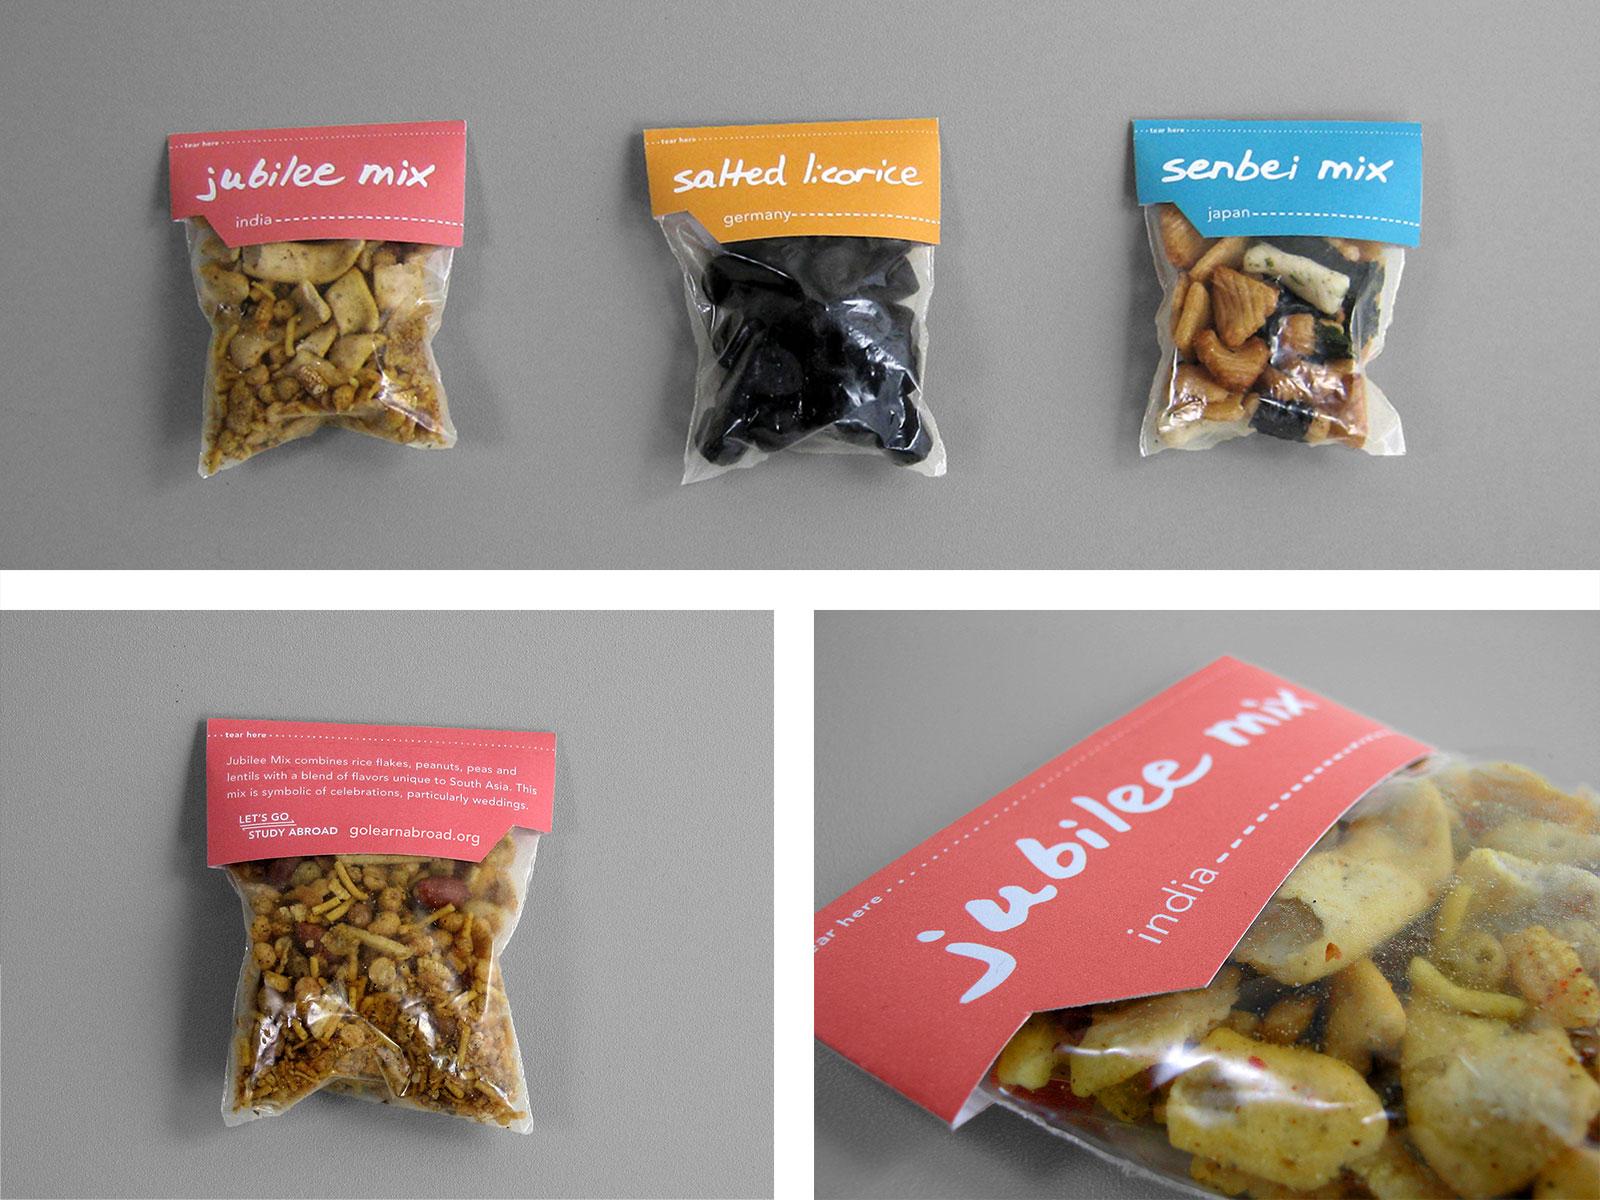 Snacks-collection_1600x1200.jpg